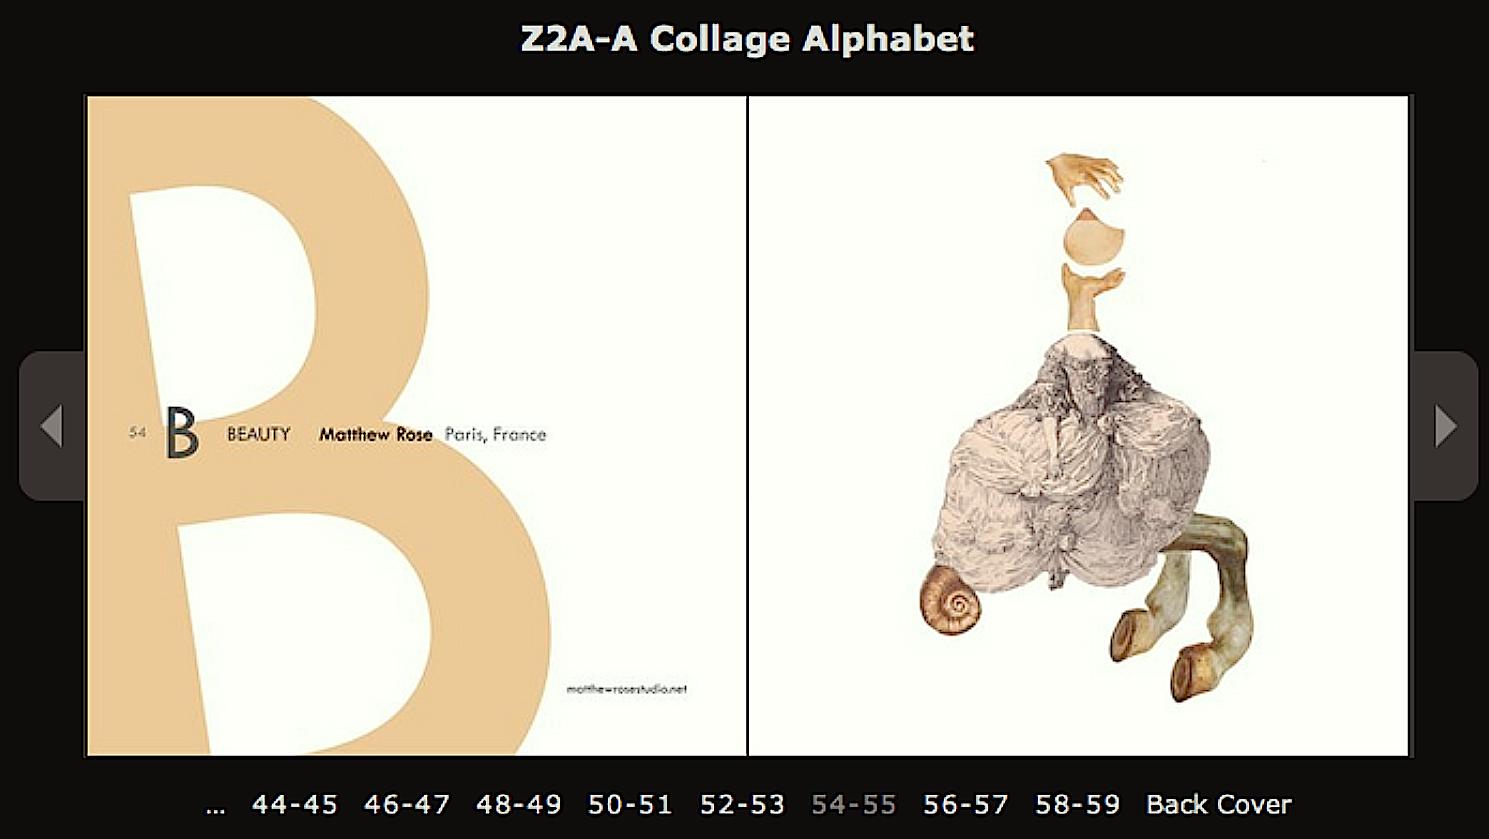 MATTHEW ROSE STUDIO Z 2 A A Collage Alphabet